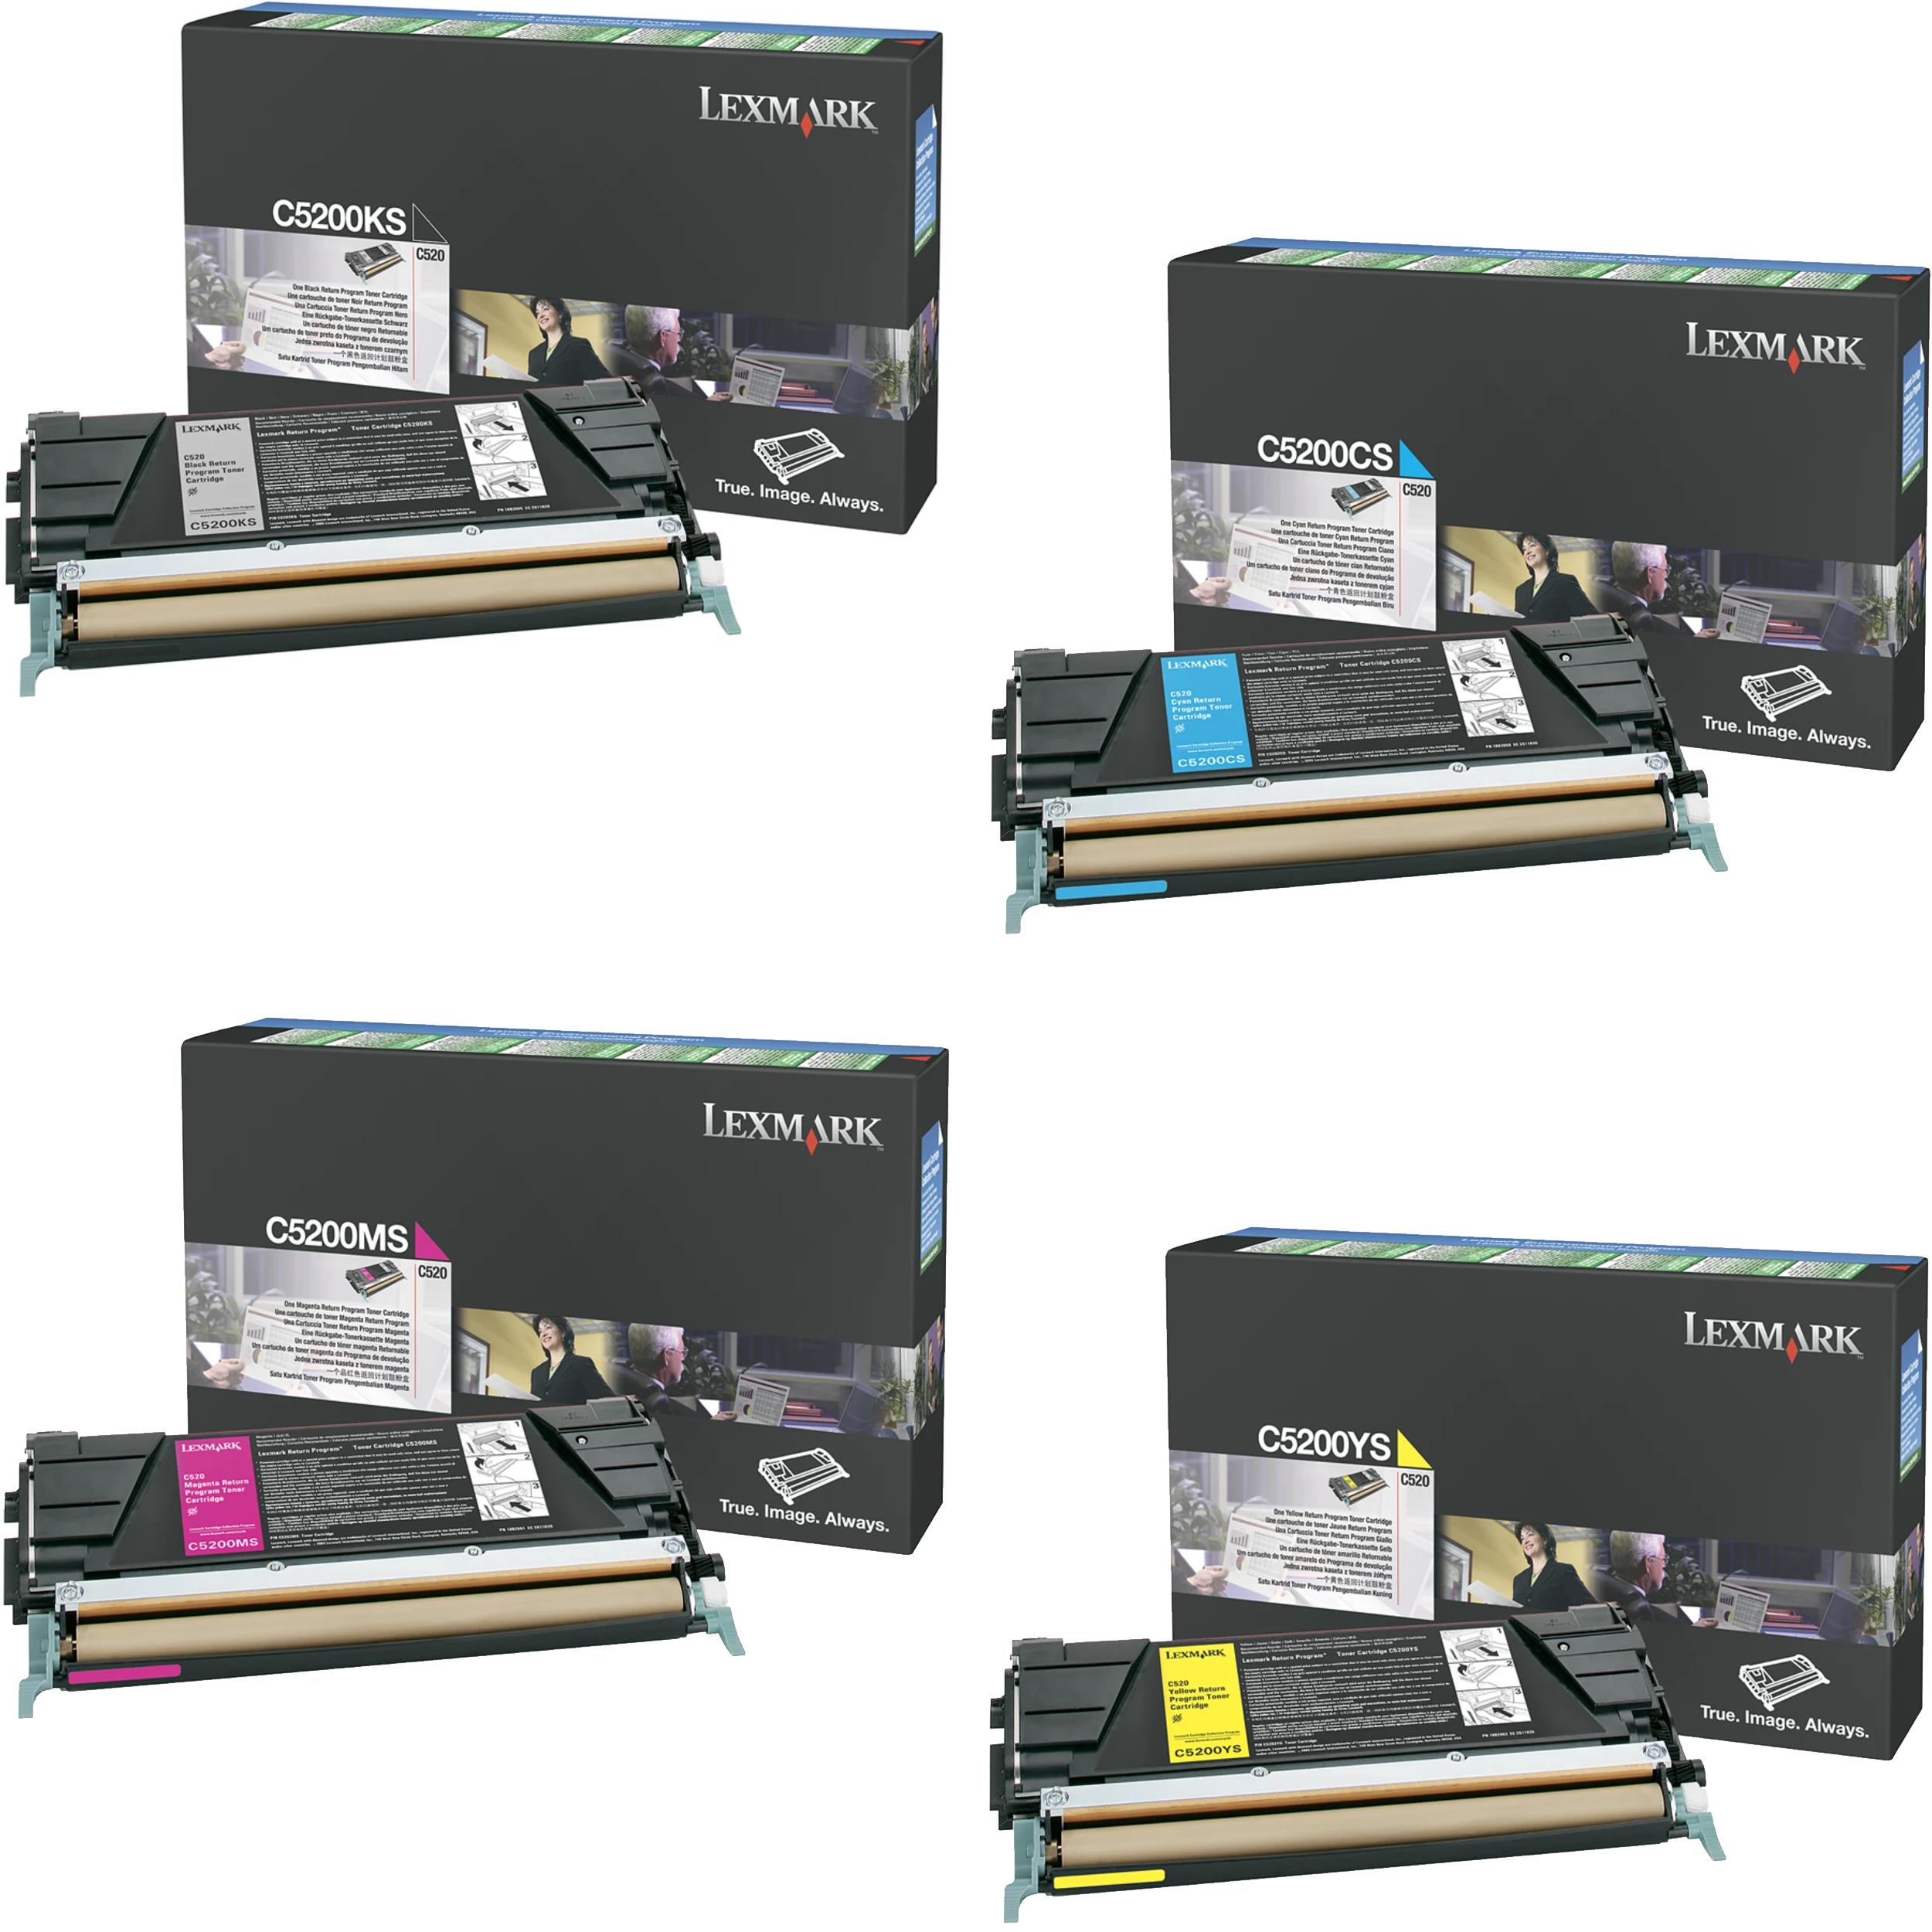 Lexmark C5200 Set   C5200CS C5200KS C5200MS C5200YS   Original Lexmark Toner Cartridges – Black, Cyan, Magenta, Yellow